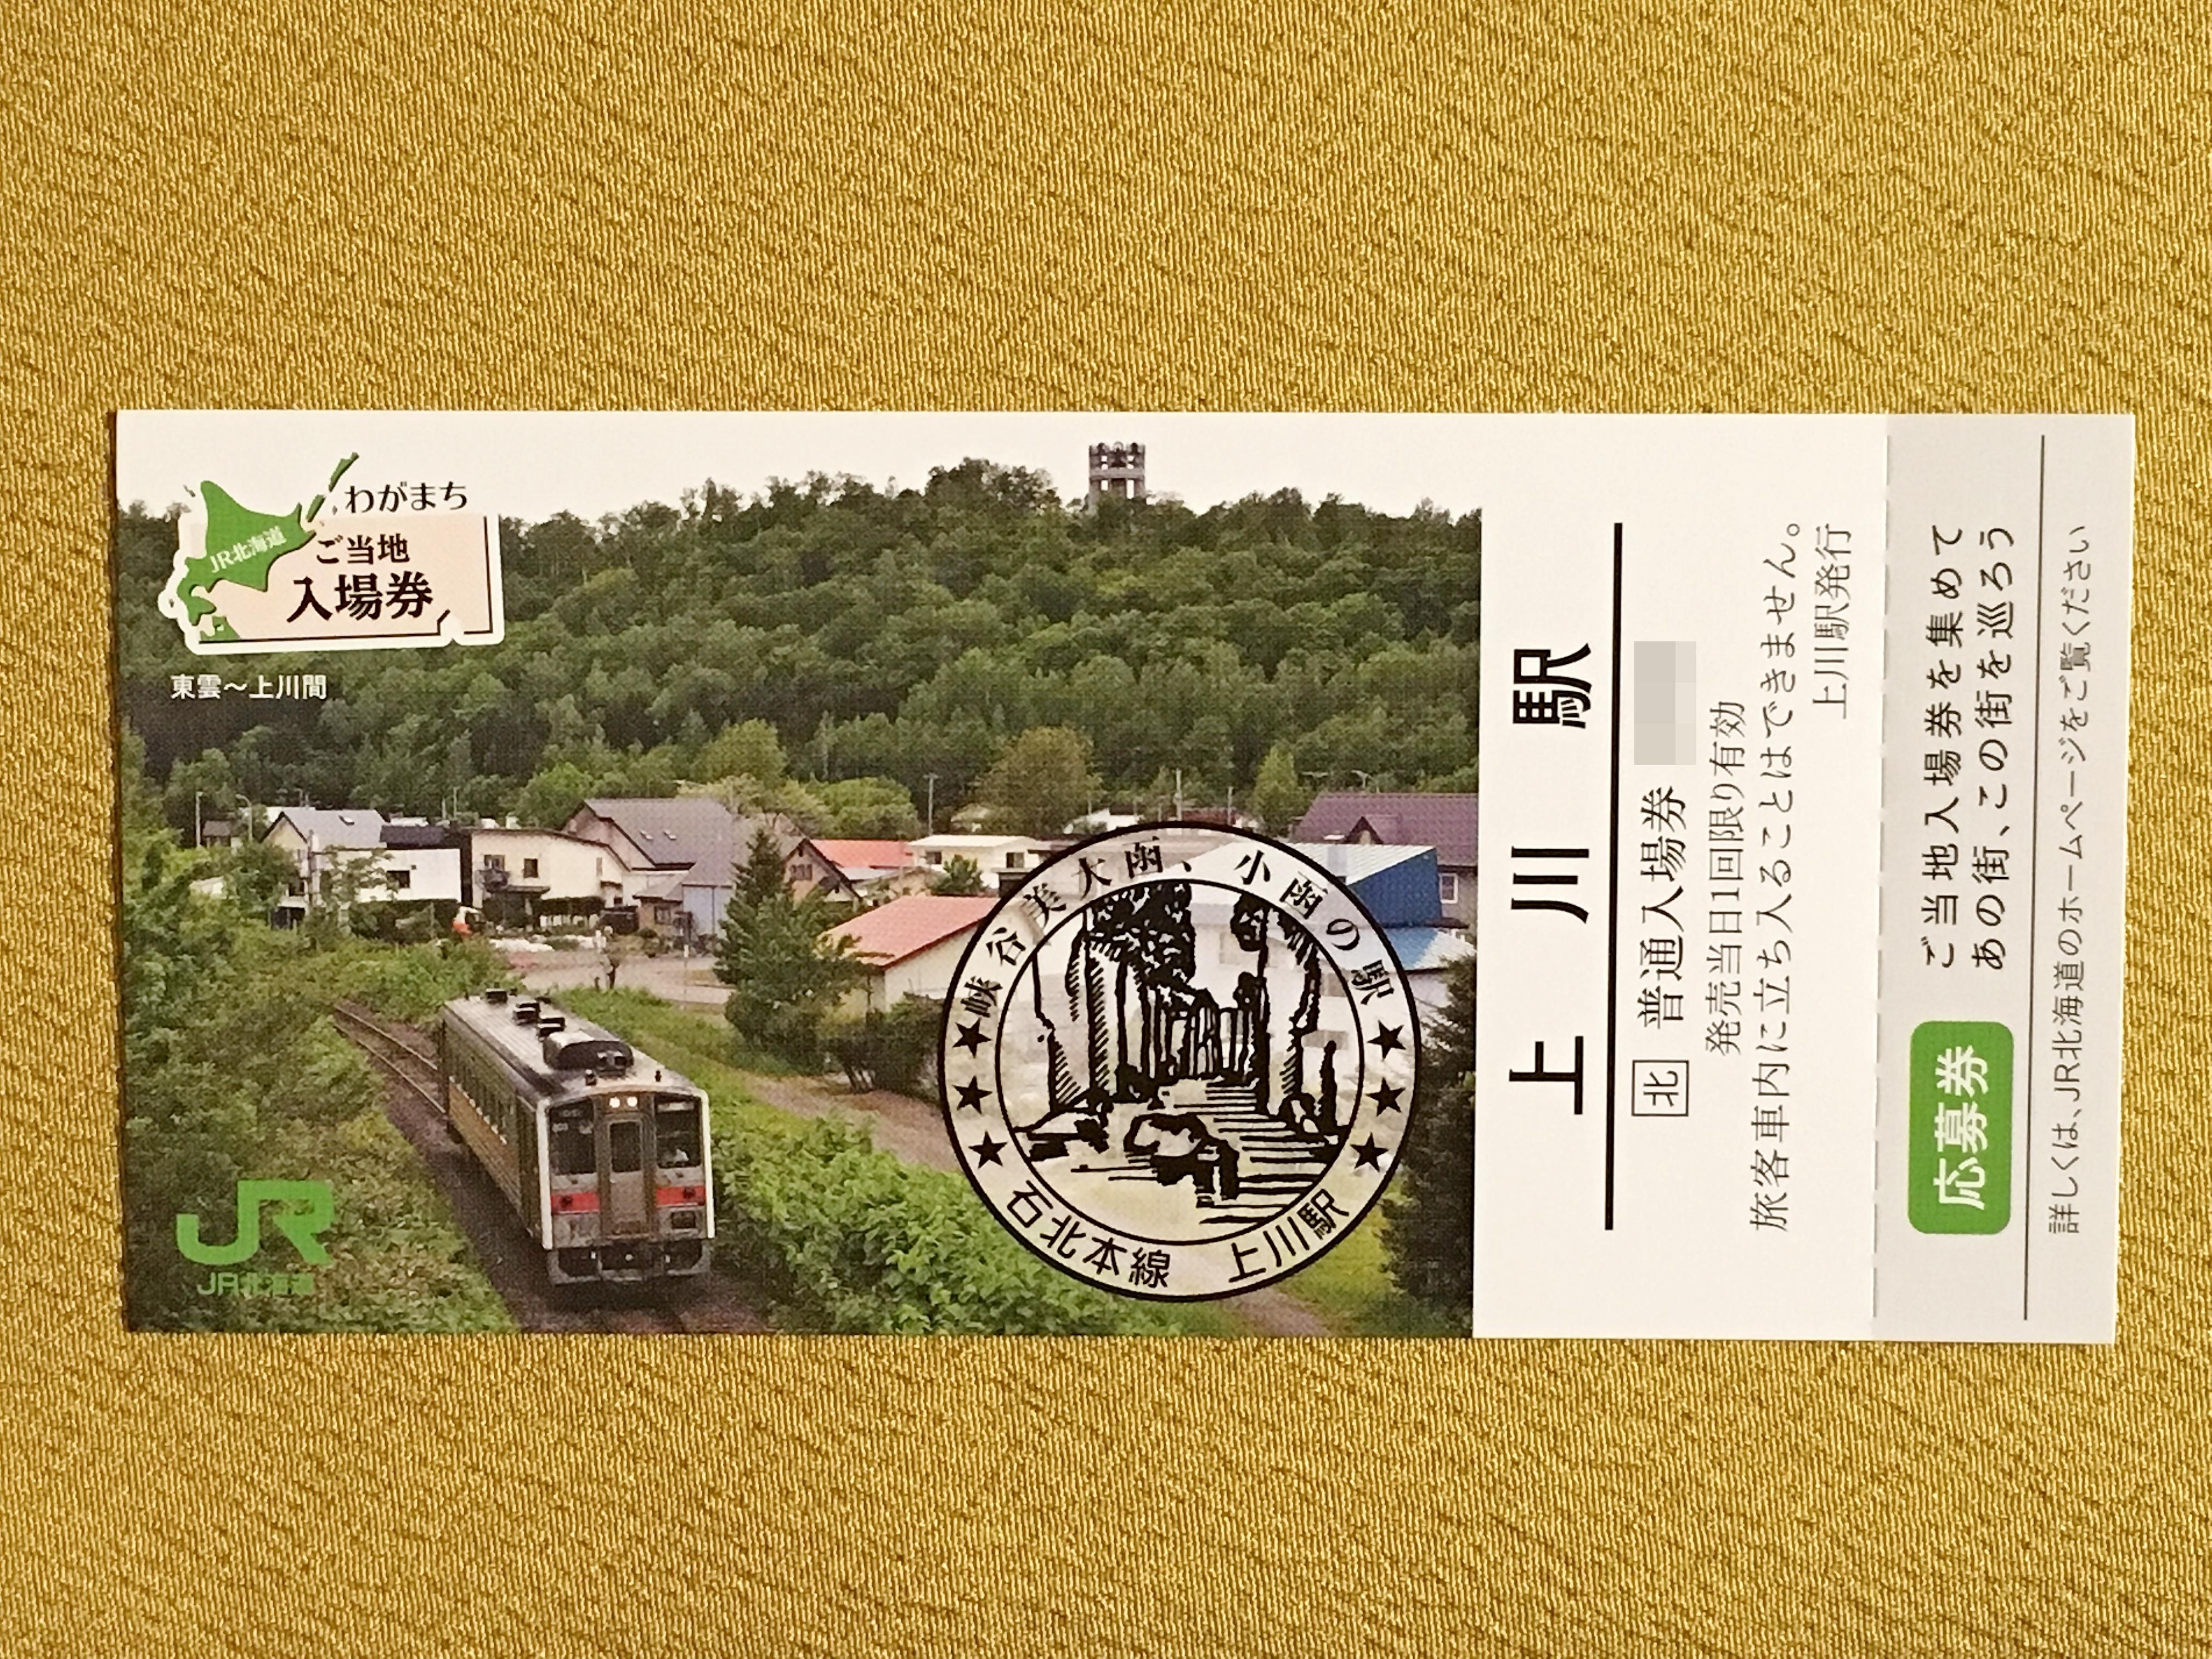 JR北海道ご当地入場券  上川駅表.JPG